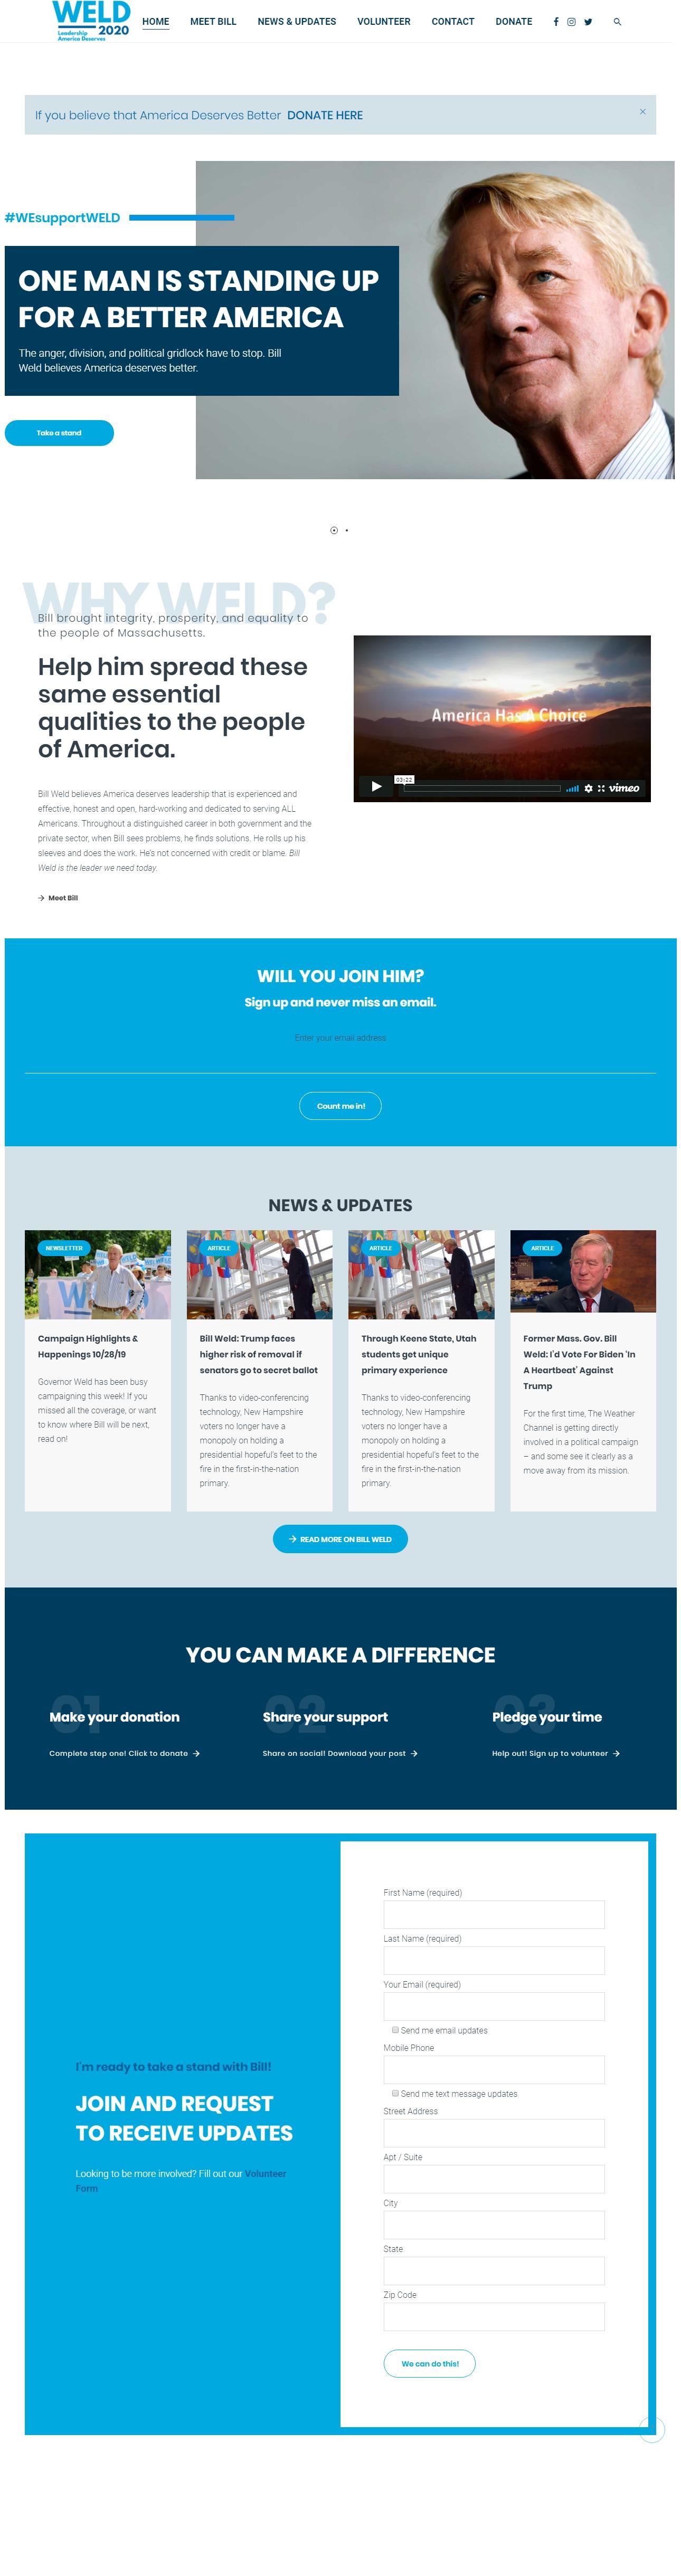 Homepage Snapshot for November 1, 2019: Former Governor Bill Weld